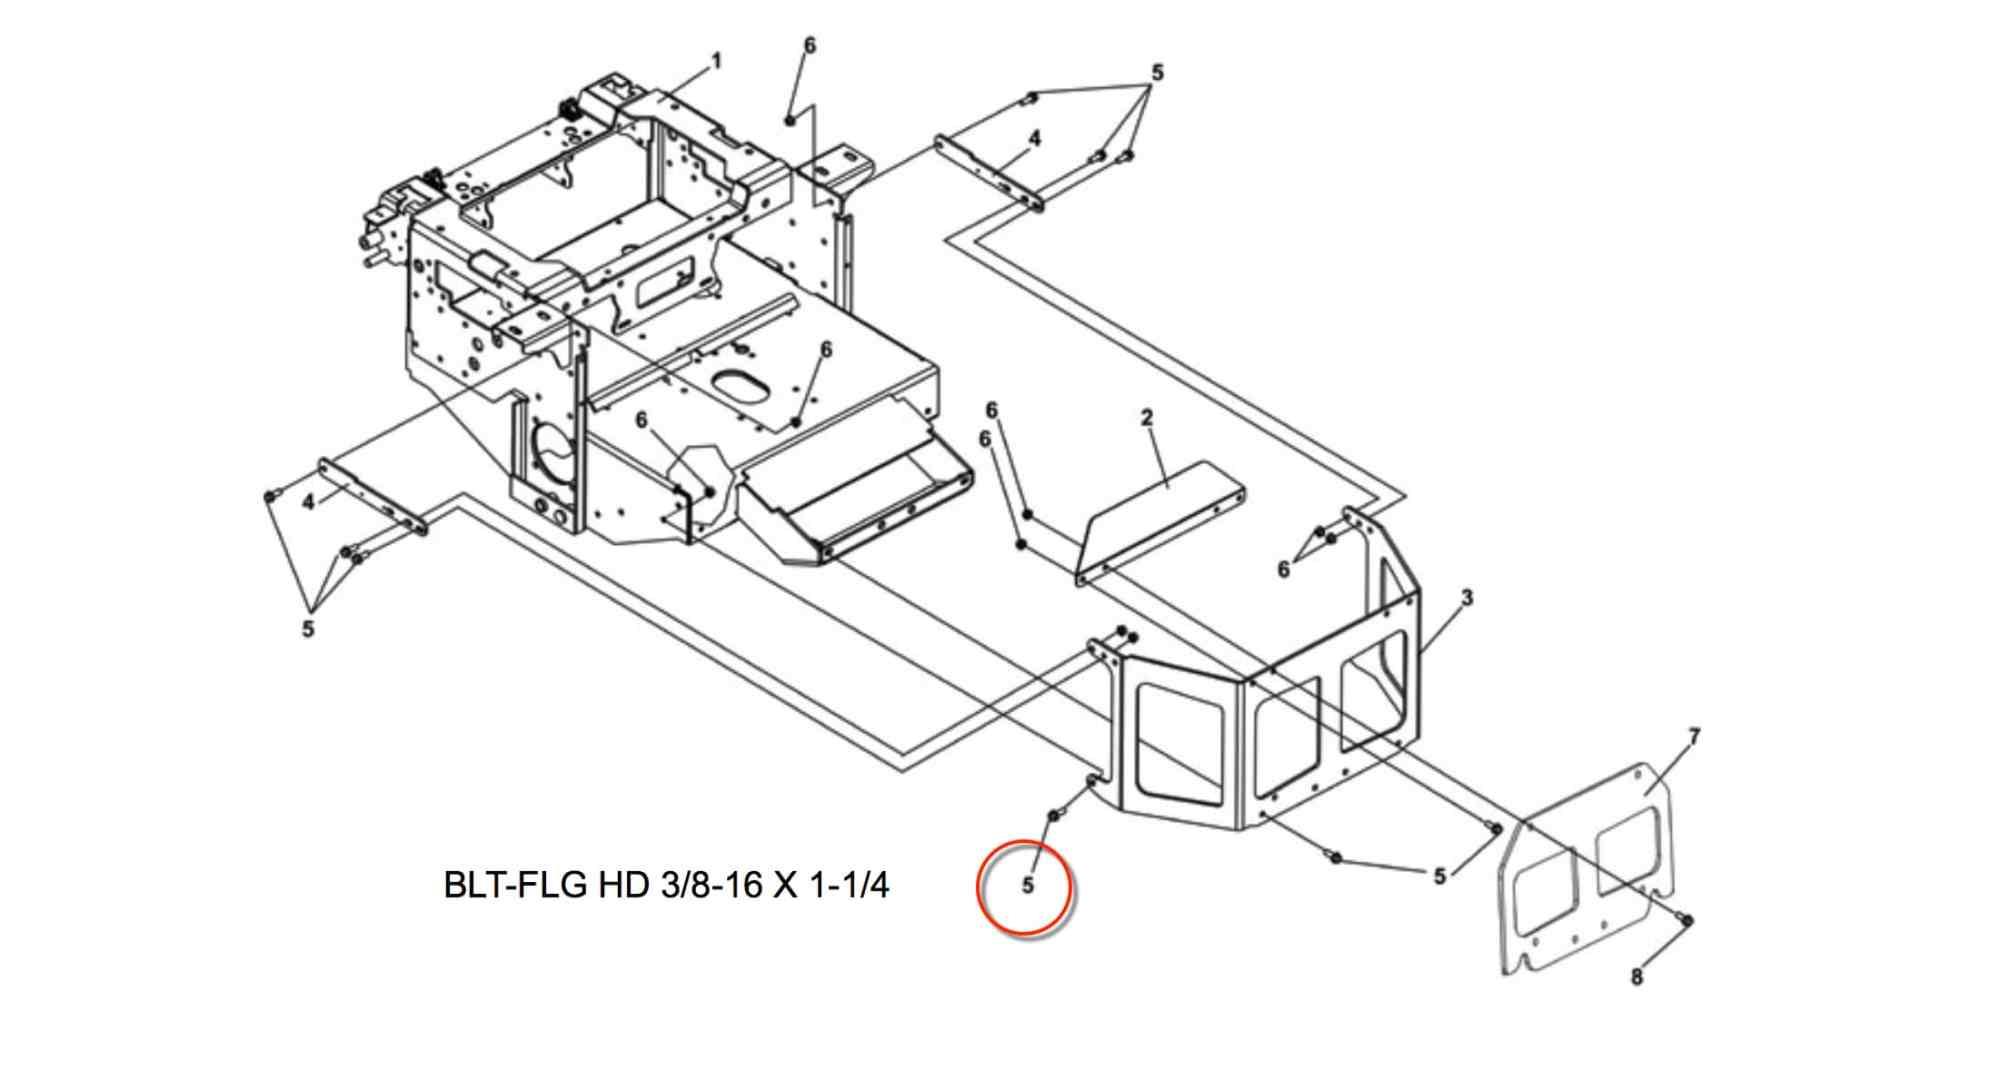 hight resolution of bobcat predator pro wiring diagram electrical wiring diagrams bobcat 873 parts diagram bobcat s130 wiring diagram